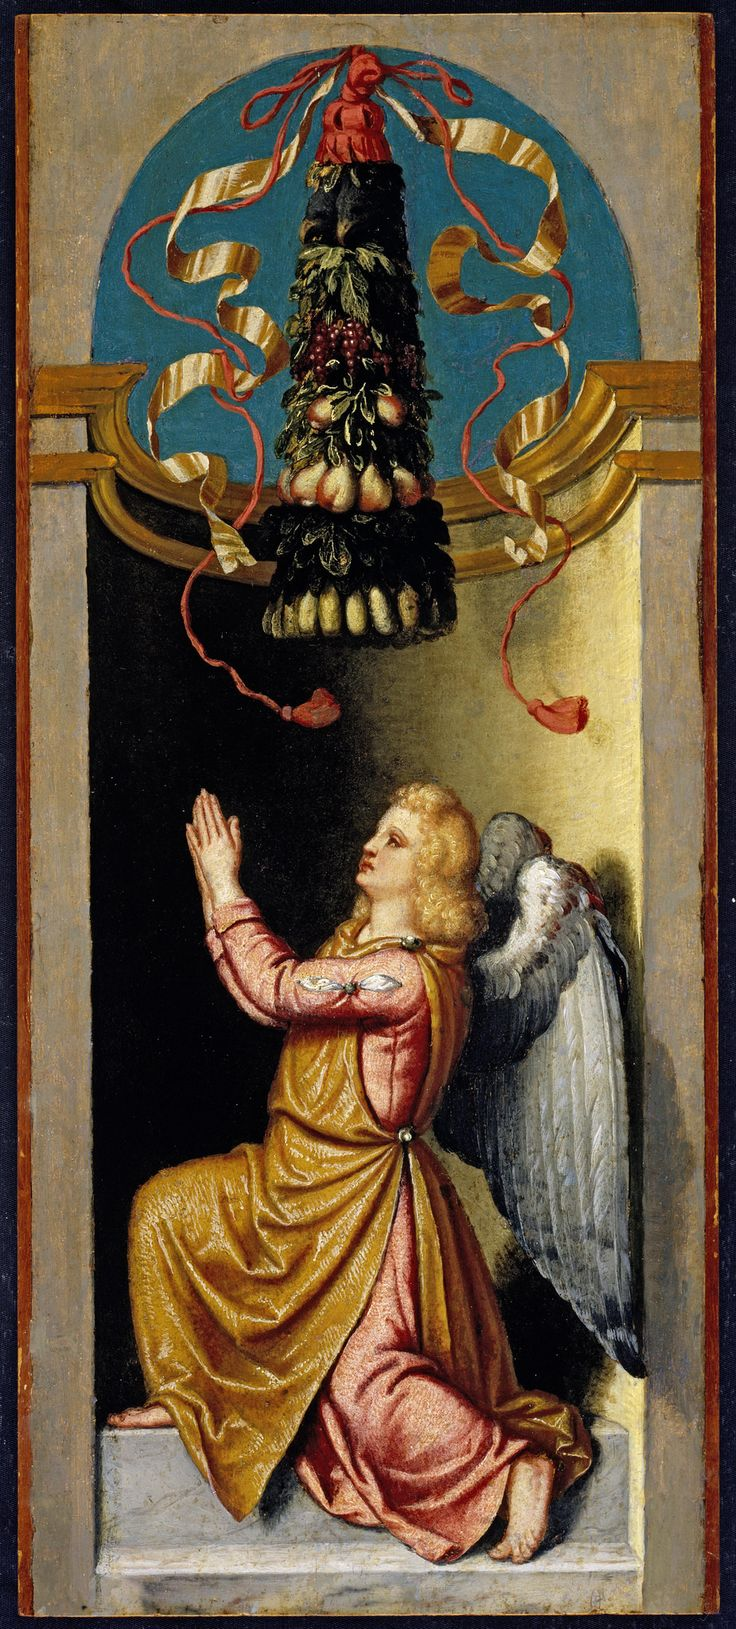 https://flic.kr/p/rh45Y2   Moretto da Brescia (Alessandro Bonvicino), Italian, 1498-1554   European paintings by old masters XIV-XVIII century